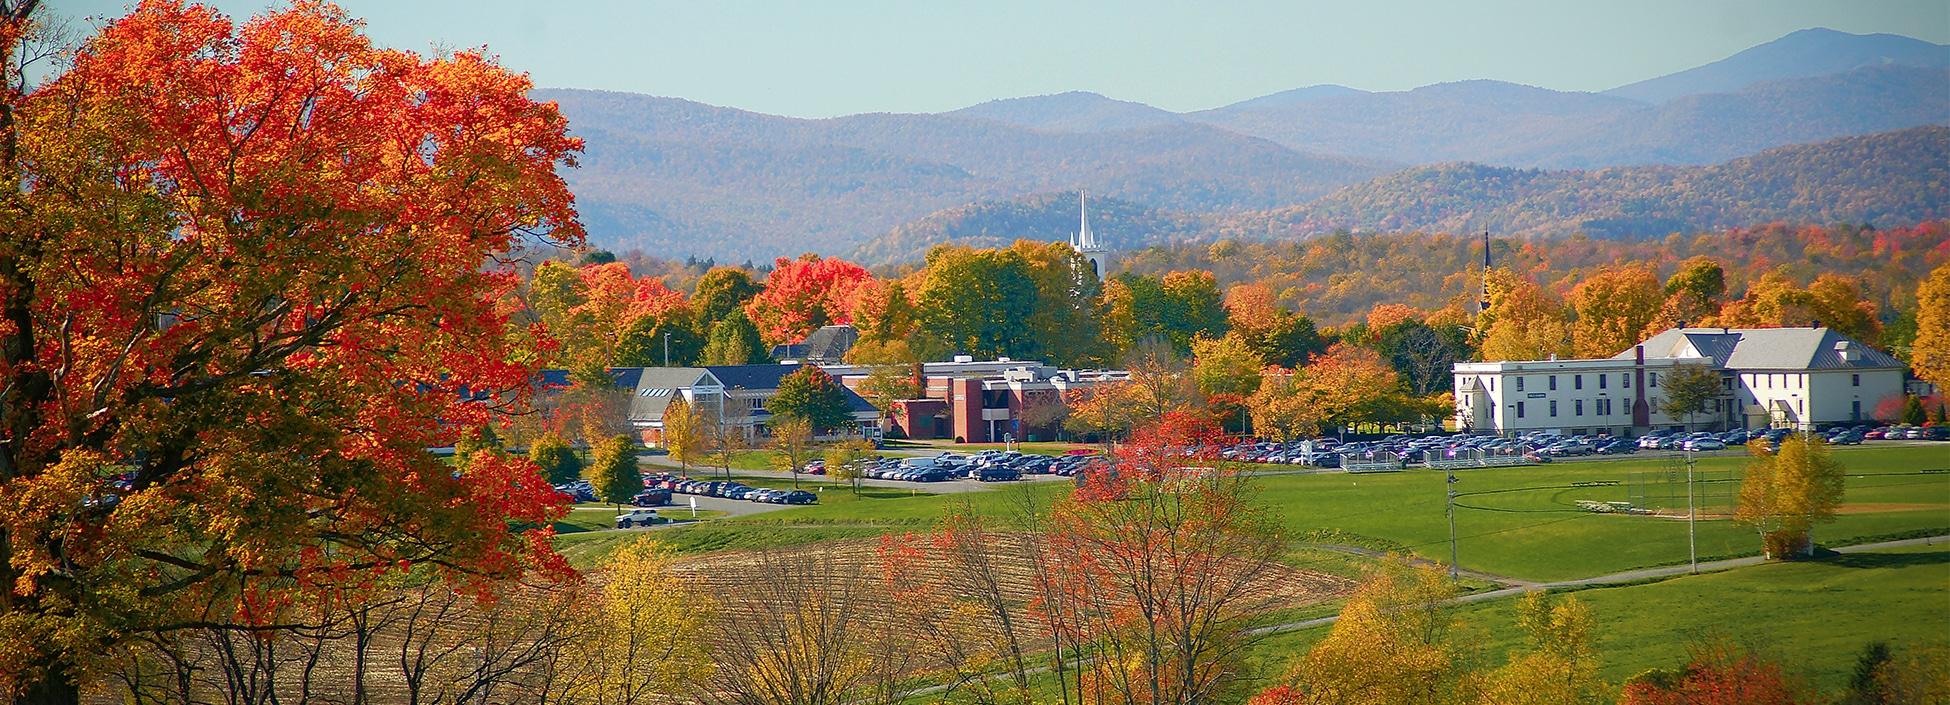 Randolph Center campus, autumn leaves, landscape, beautiful